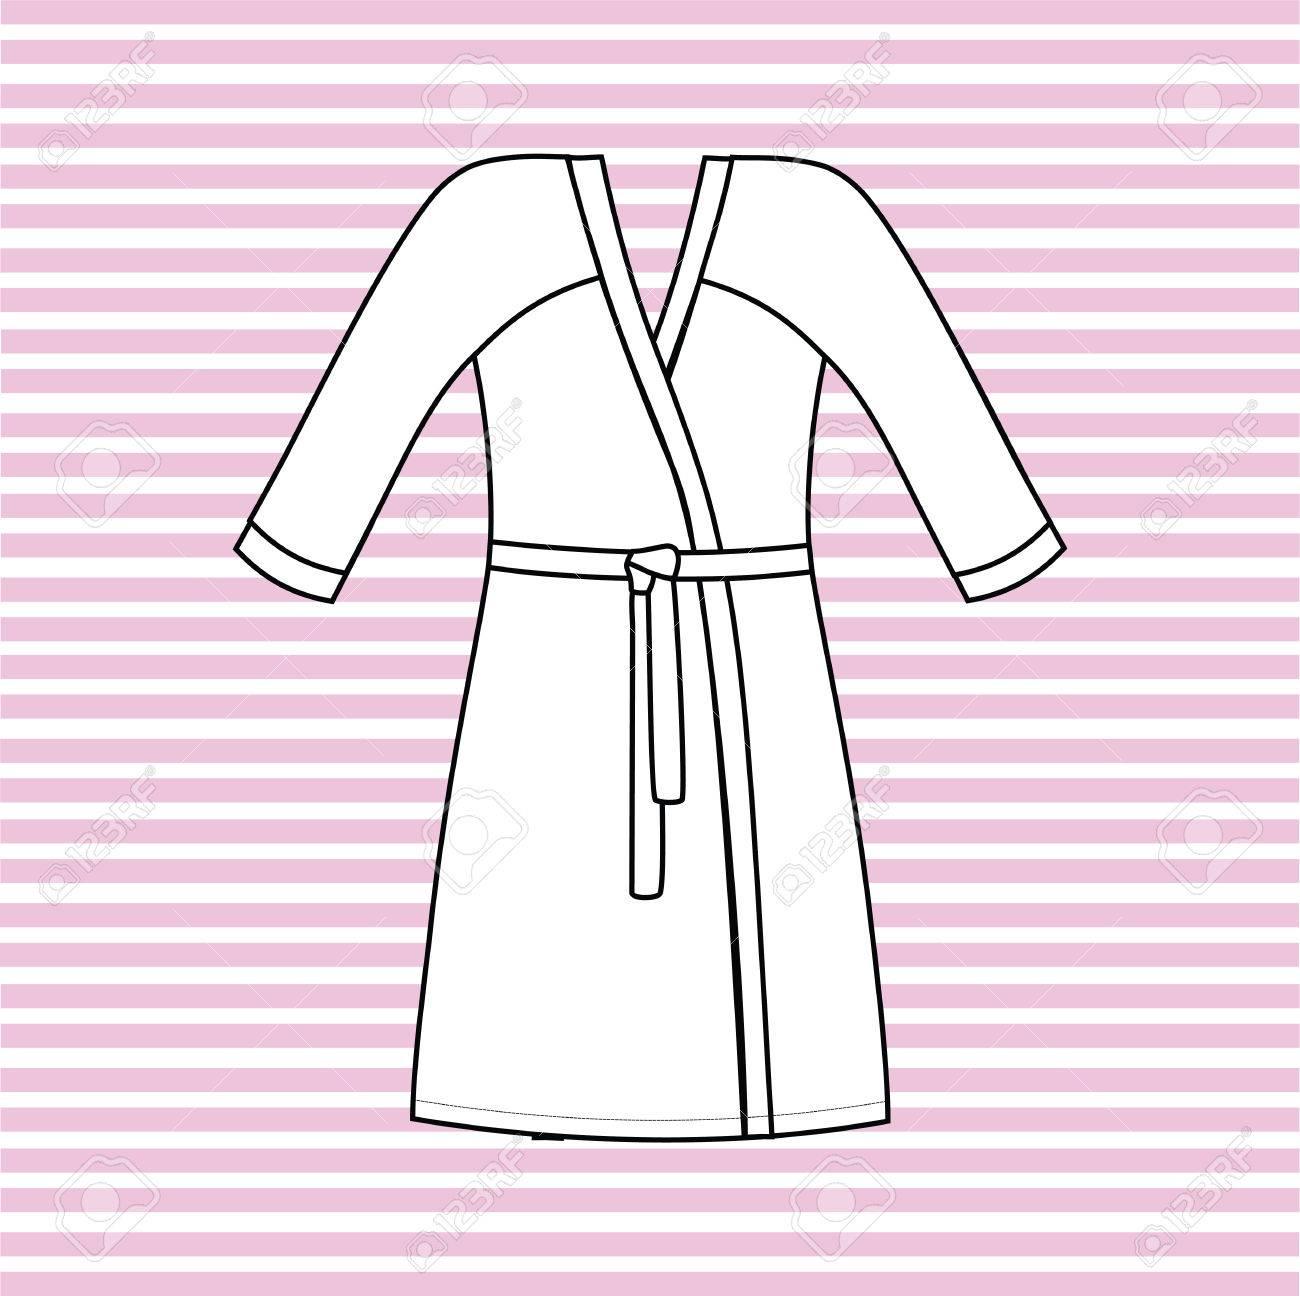 53b5105023 Gown Female Home. Bathrobe Drawn Vector. Royalty Free Cliparts ...